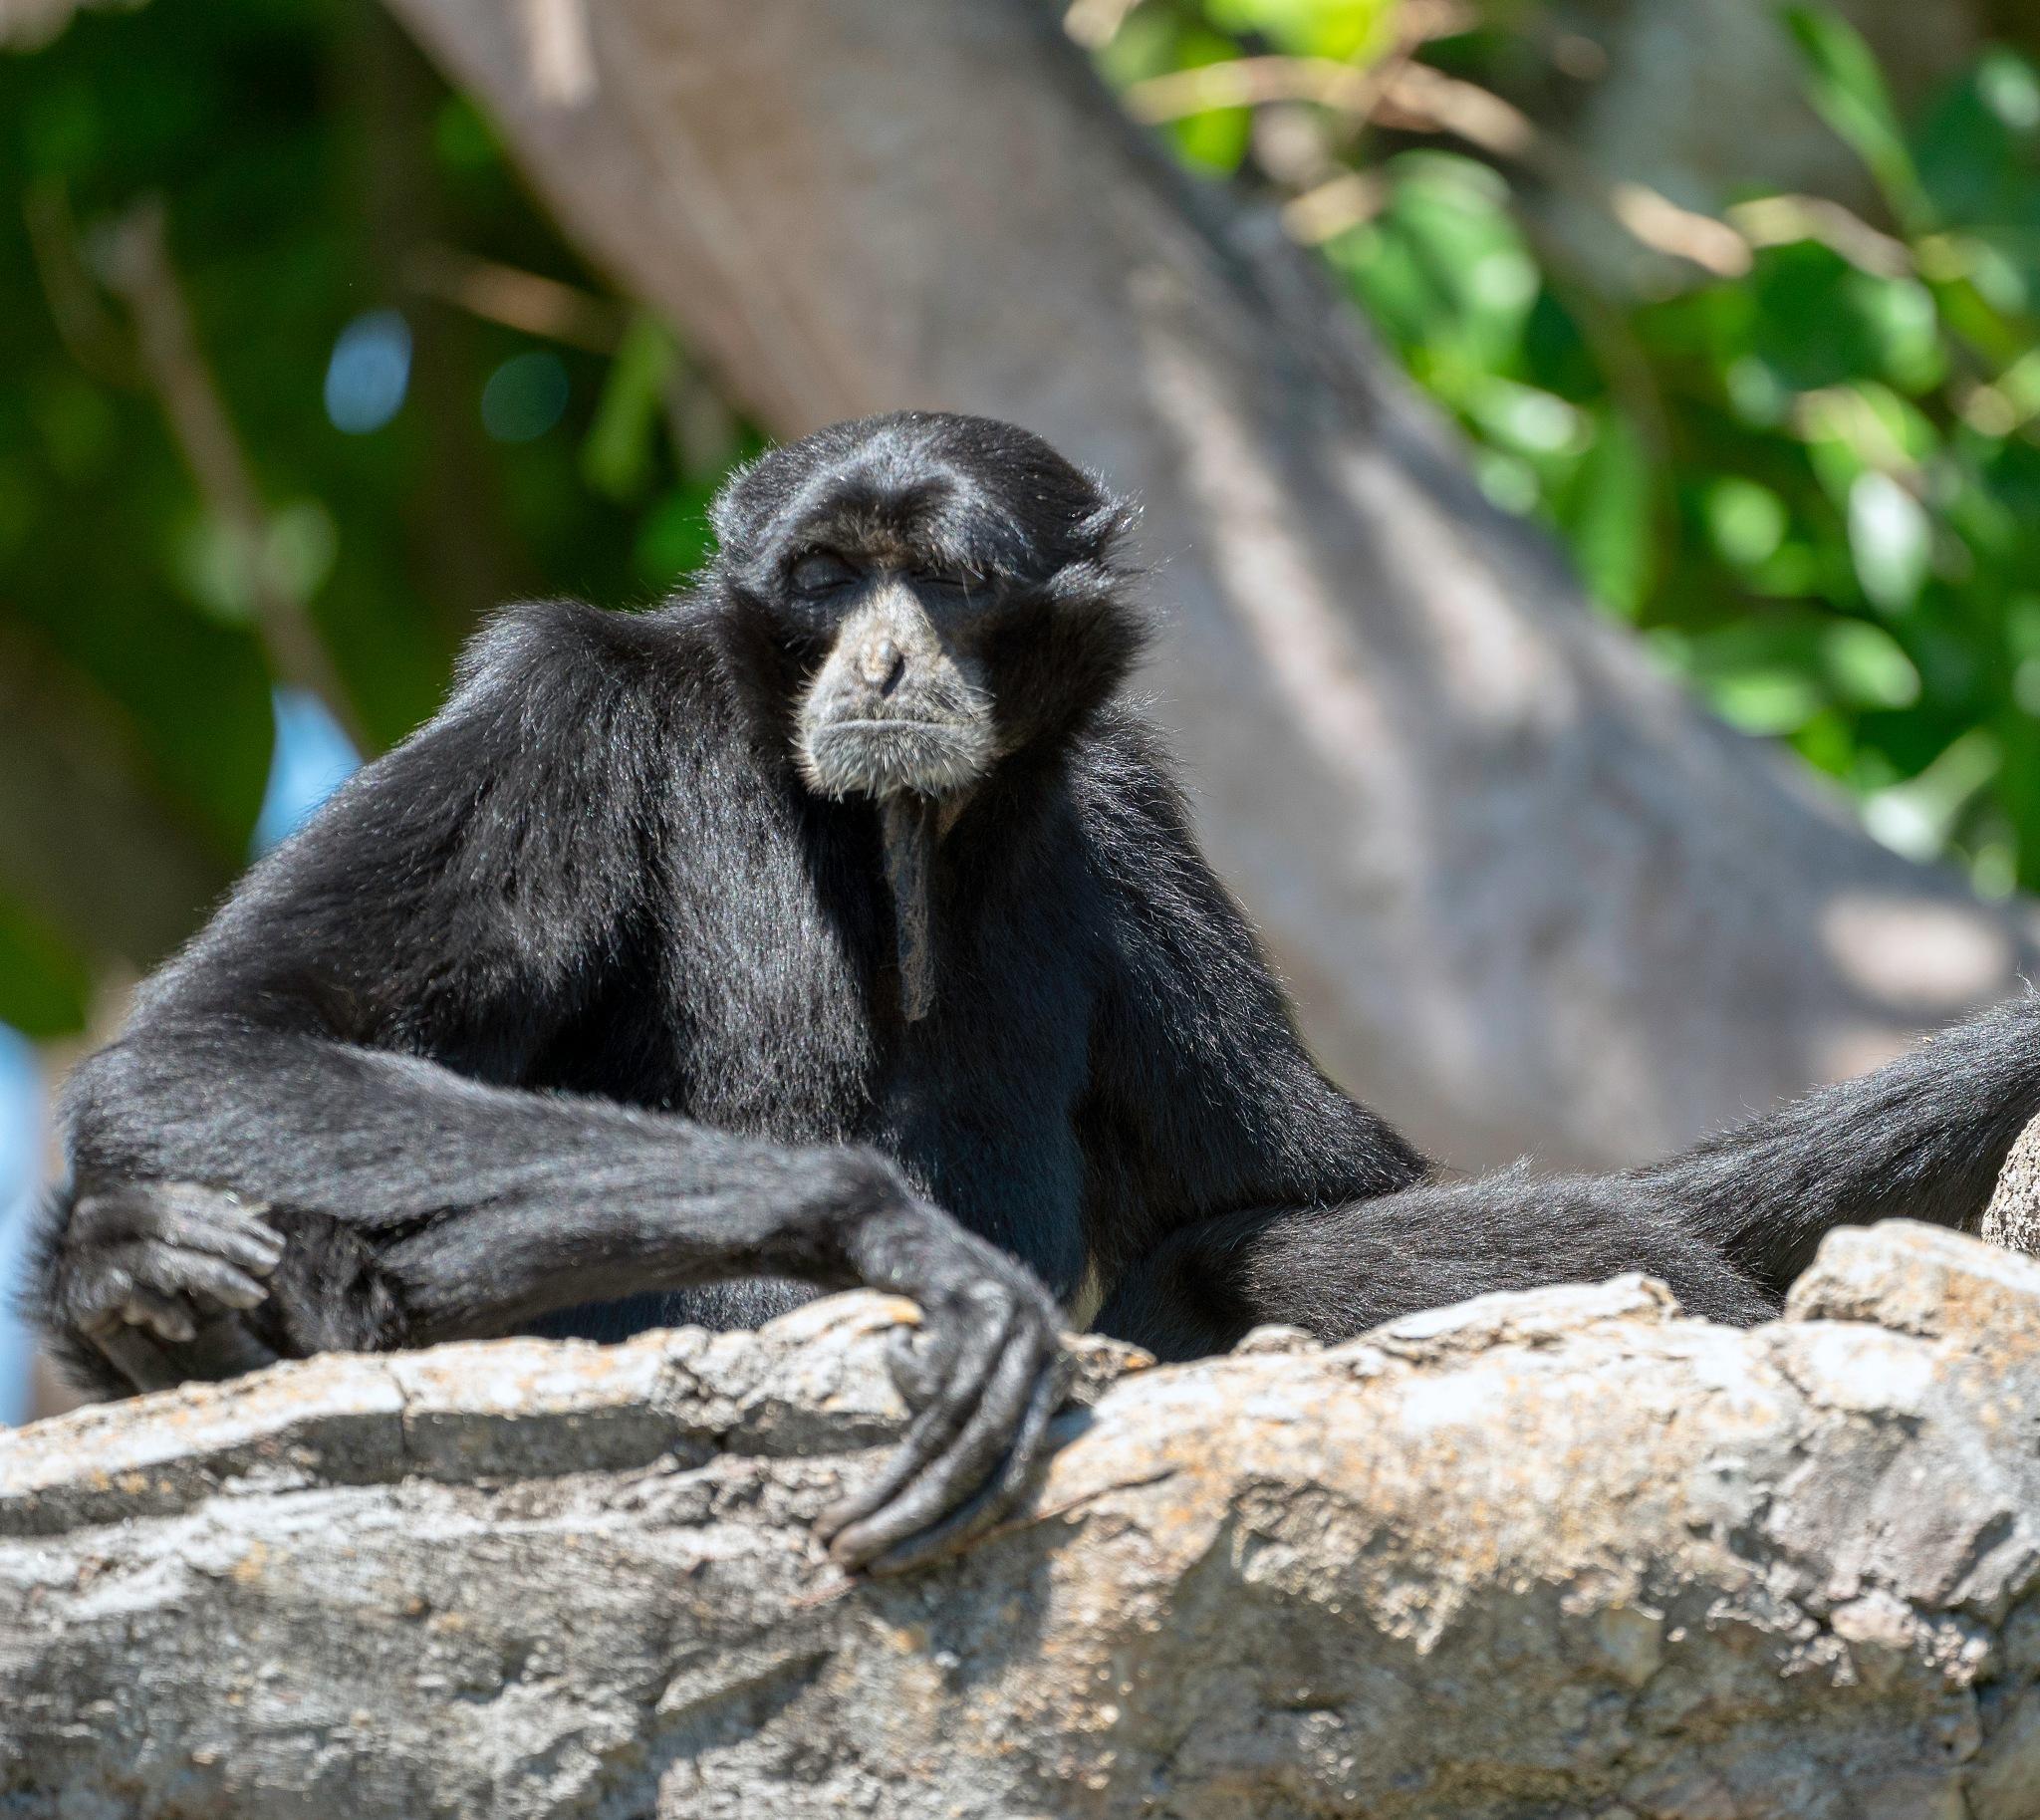 White Checked Gibbon by elenafeinsilver